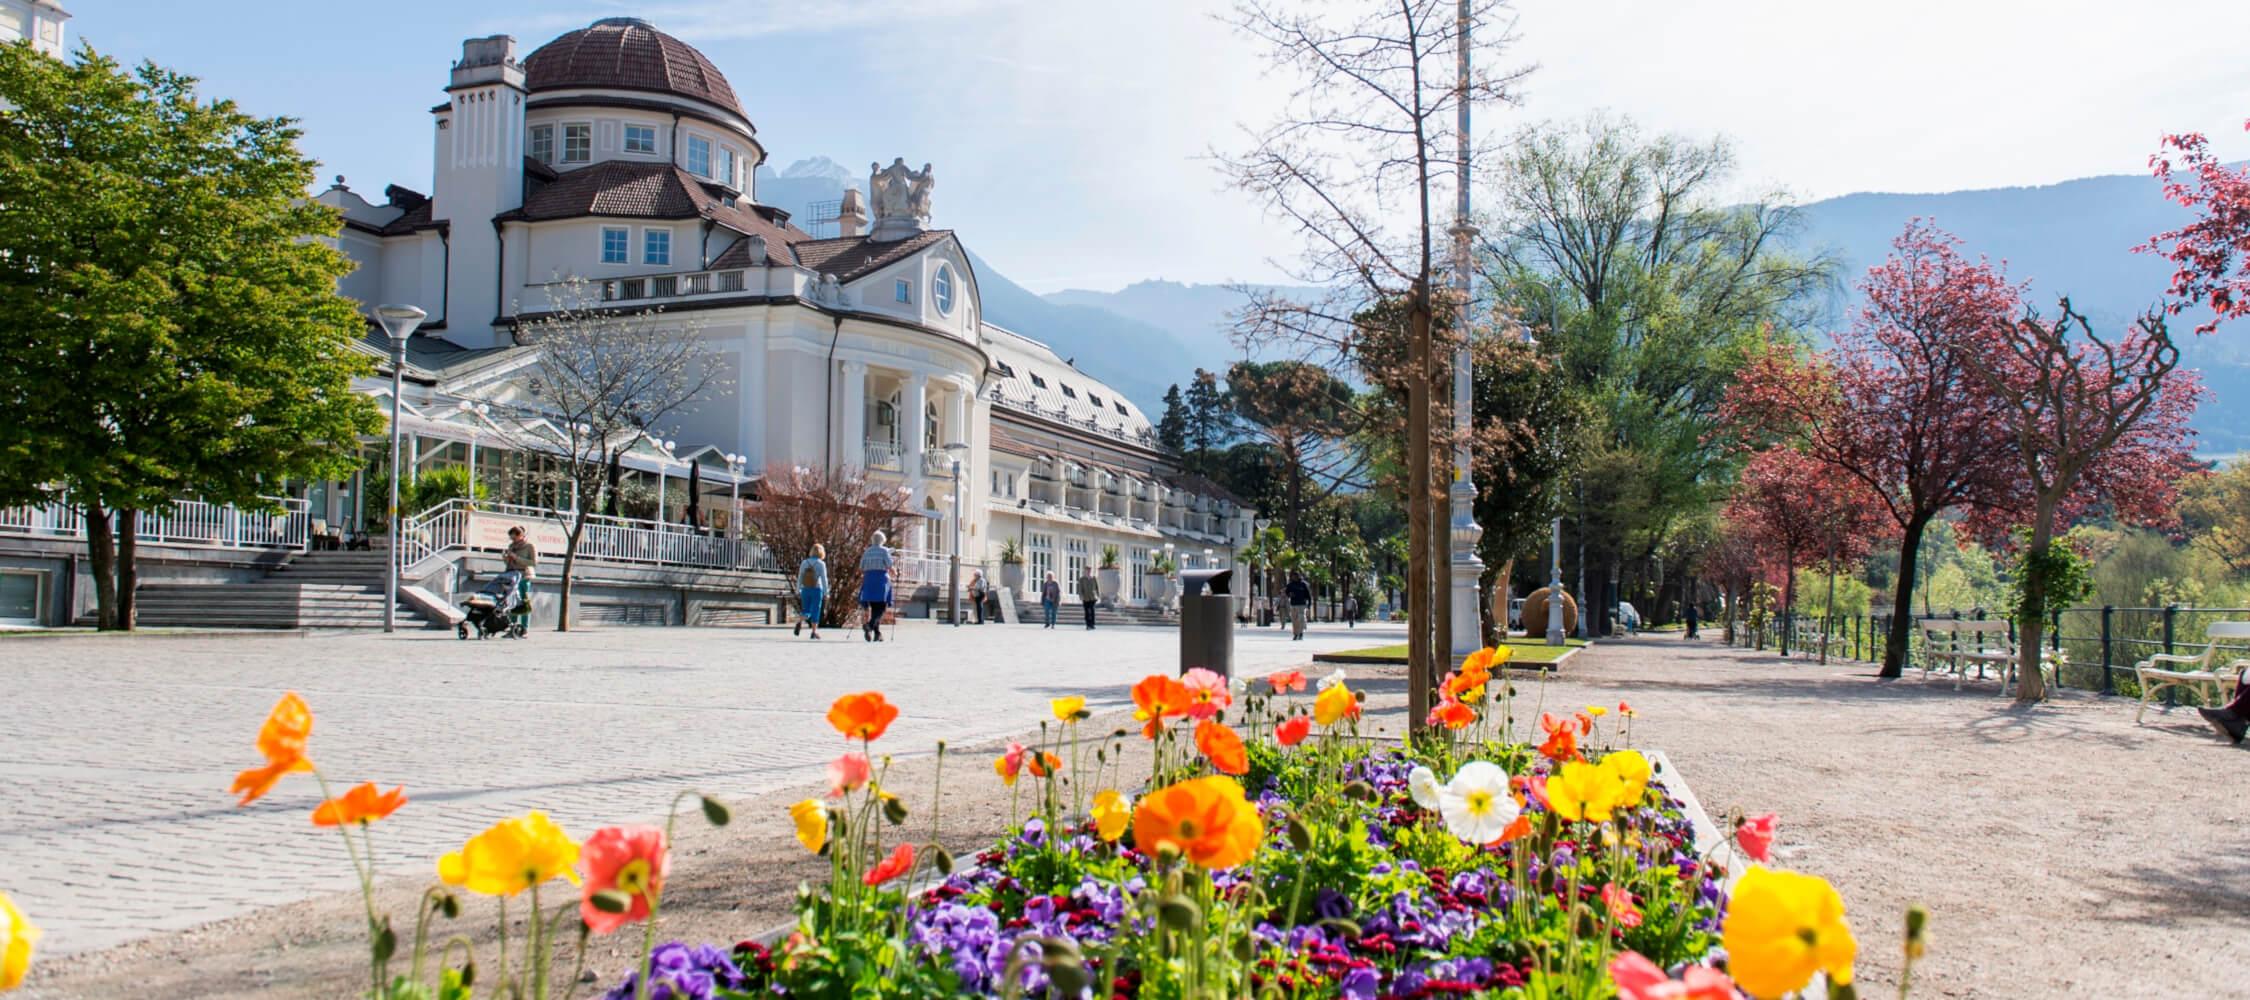 Italien-Trentino_Suedtirol_Alto_Adige_Merano_Meran_Natur_Promenade_Kurhaus_Spring_Kurverwaltung_Meran_AlexFilz_2250x1000